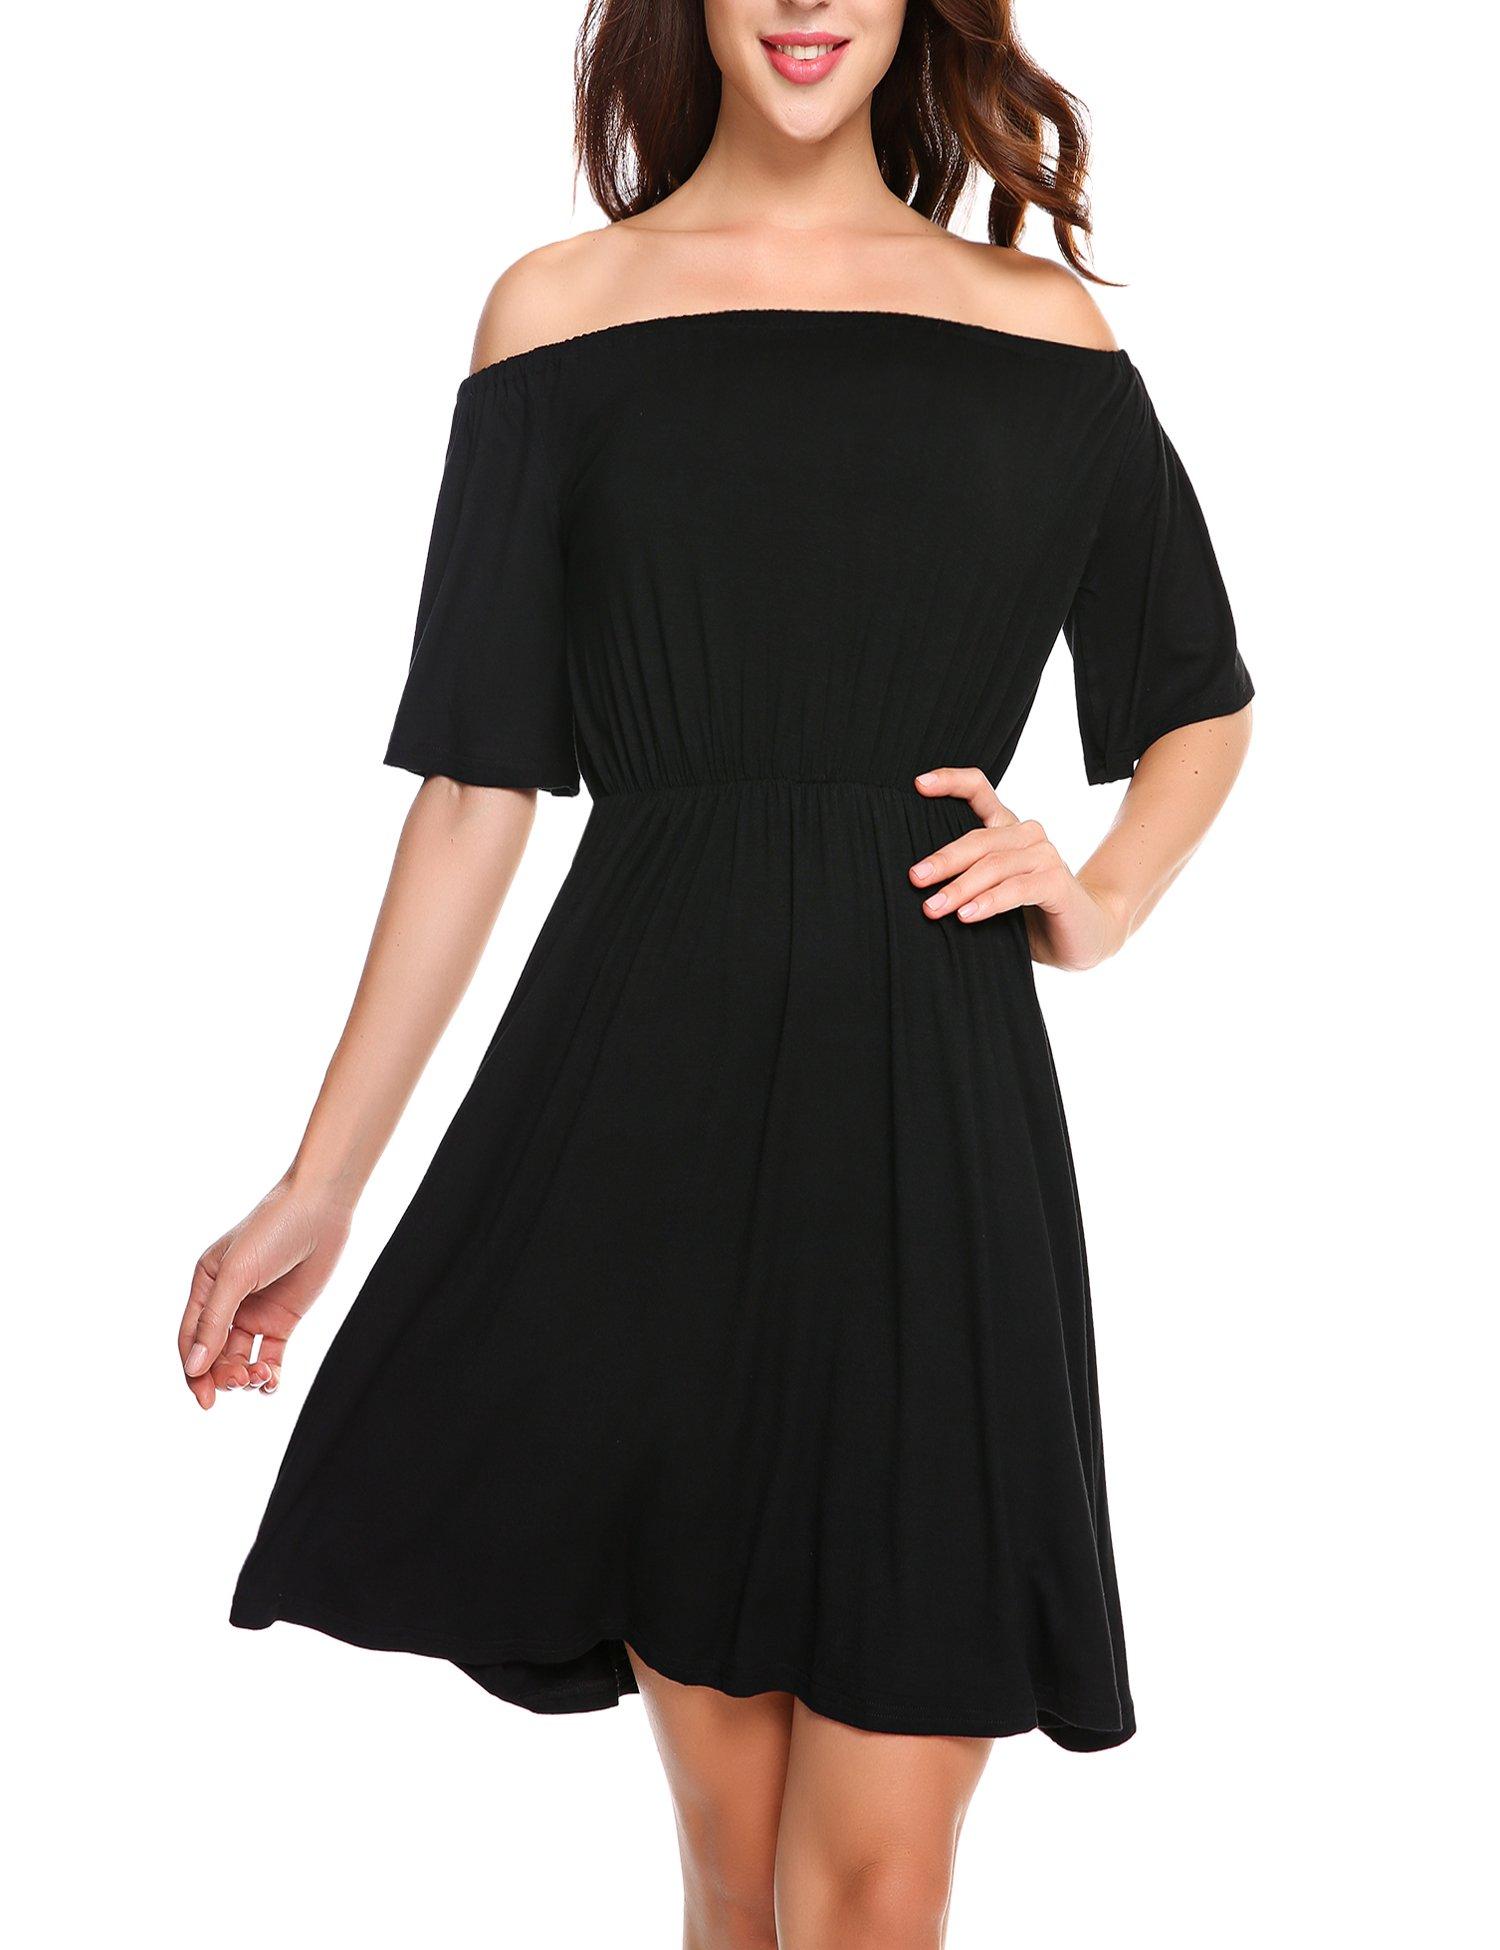 Finejo Women's Sexy Cold Shoulder Half Sleeve Bodycon Club Midi Dress